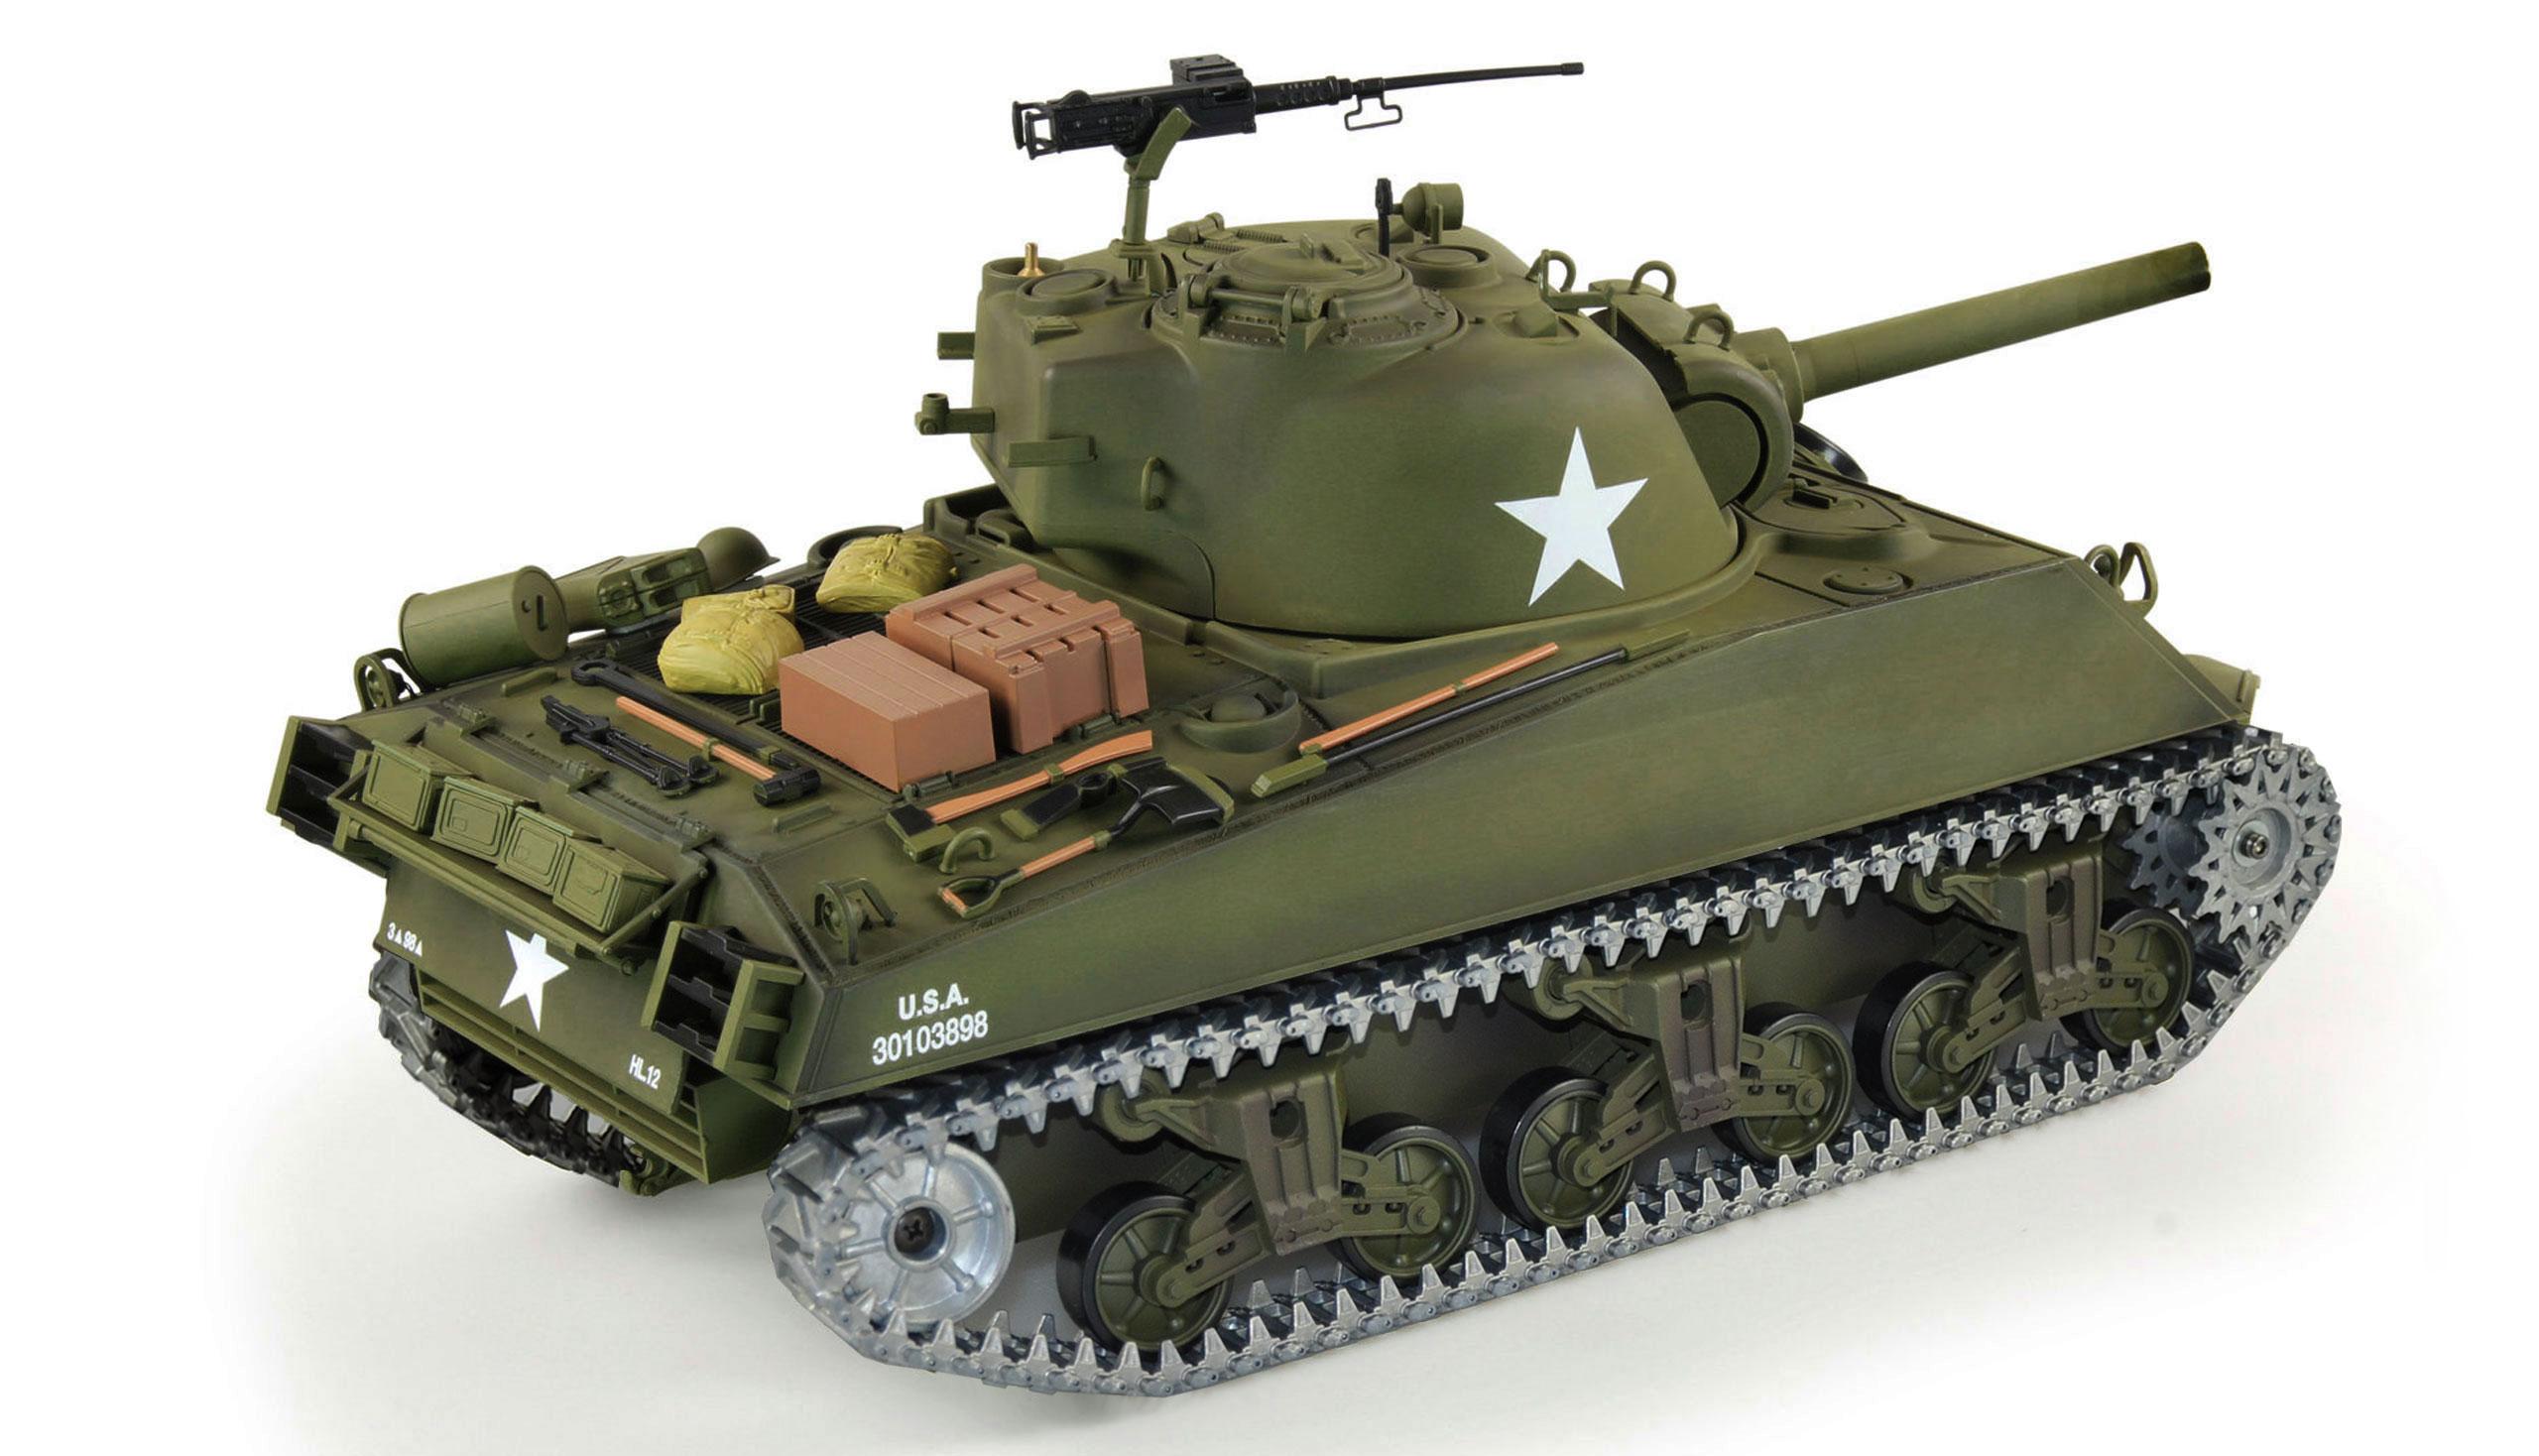 Amewi U.S. M4A3 Sherman - Funkgesteuerter (RC) Panzer - Elektromotor - 1:16 - Betriebsbereit (RTR) - Junge - 14 Jahr(e)